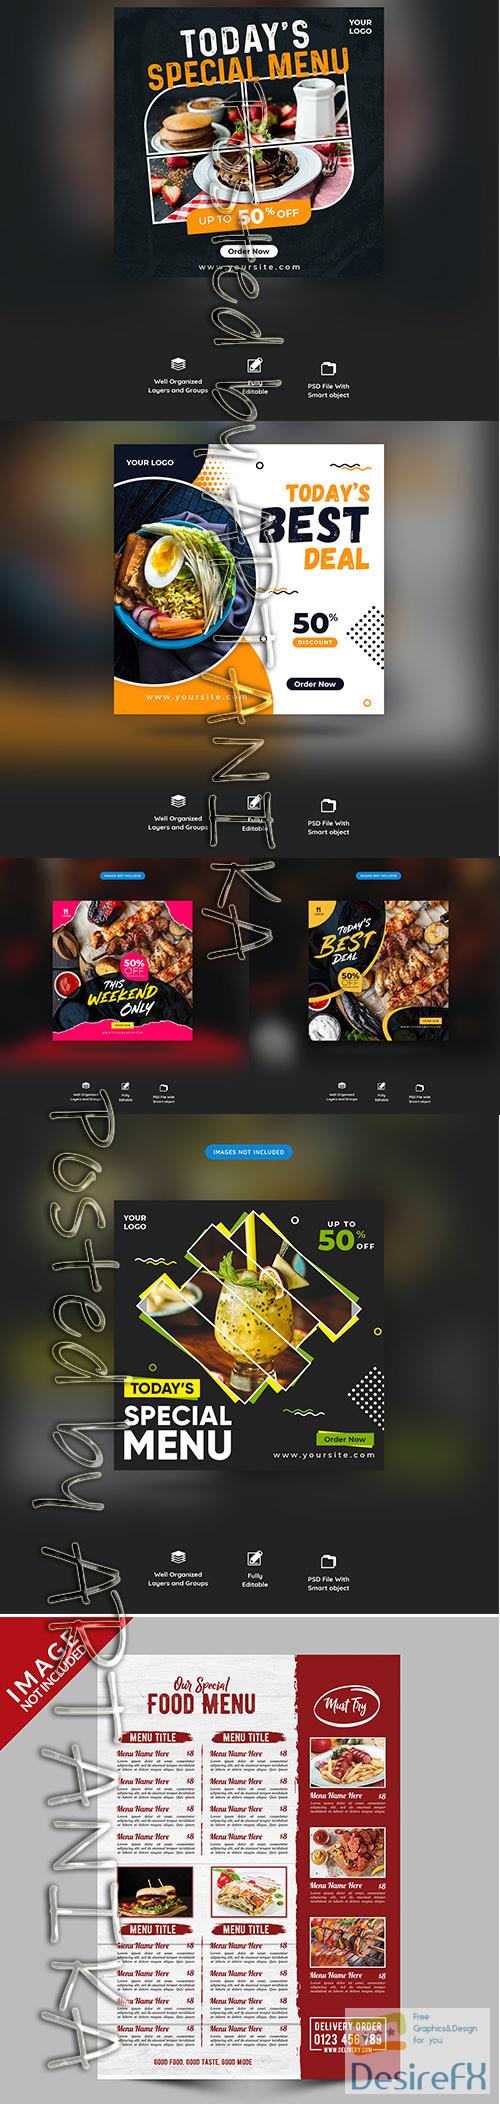 layered-psd - Restaurant Food Menu Social Media Post and Menu Template